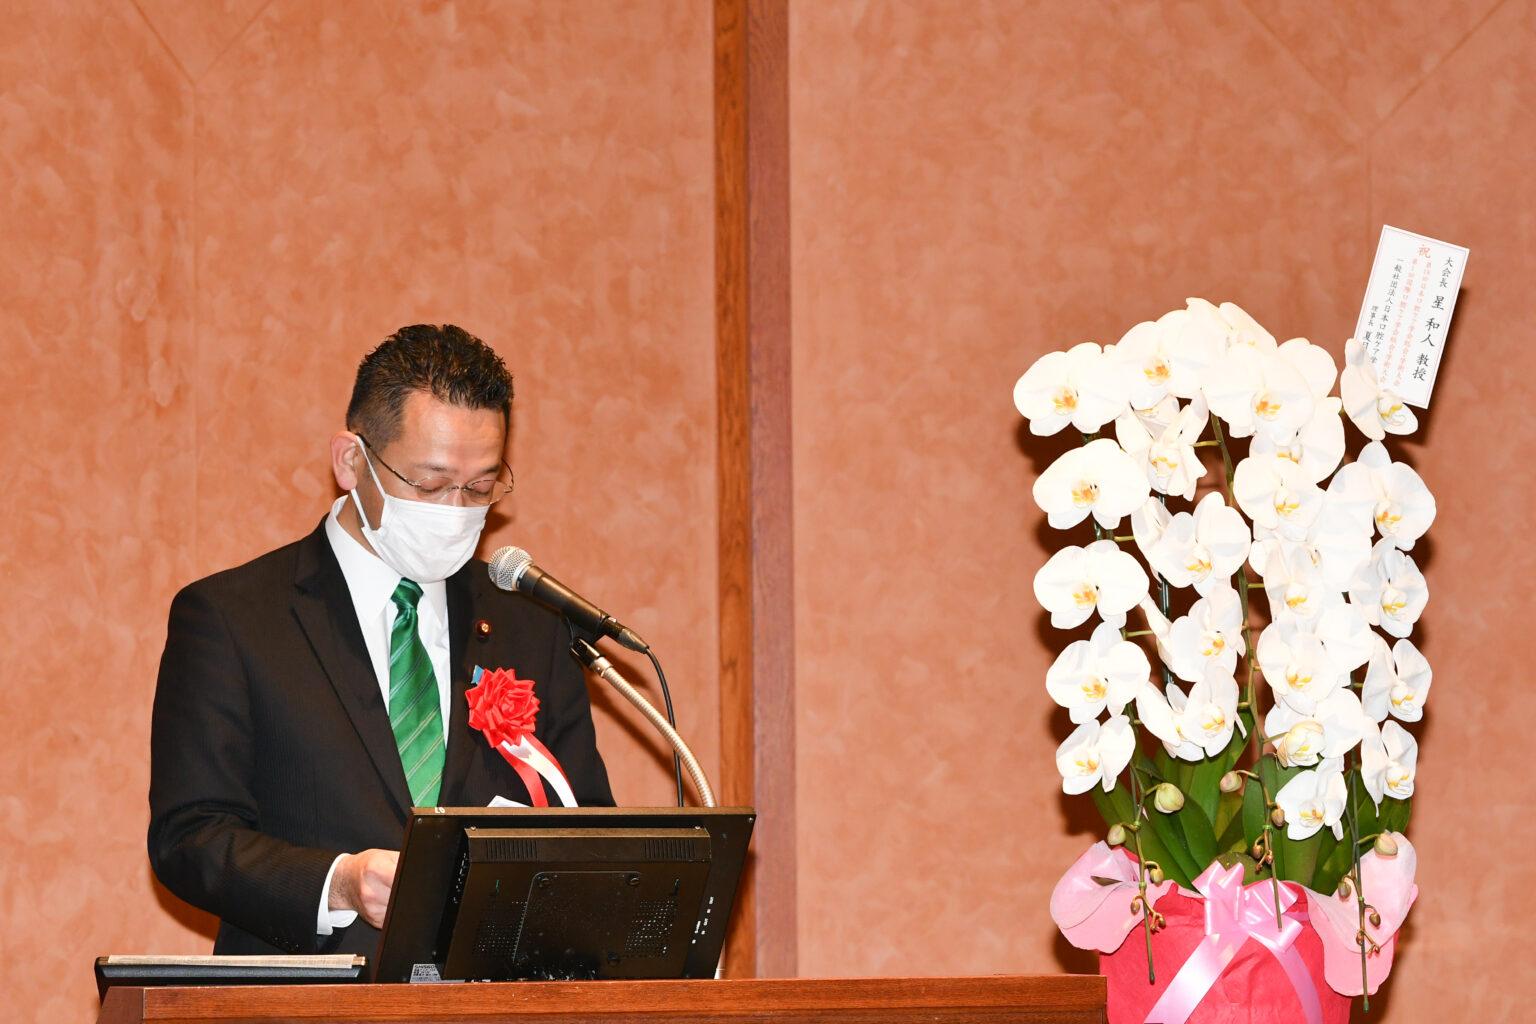 Dr.Satoru Komatsumoto, President, Asian Hospital Federation